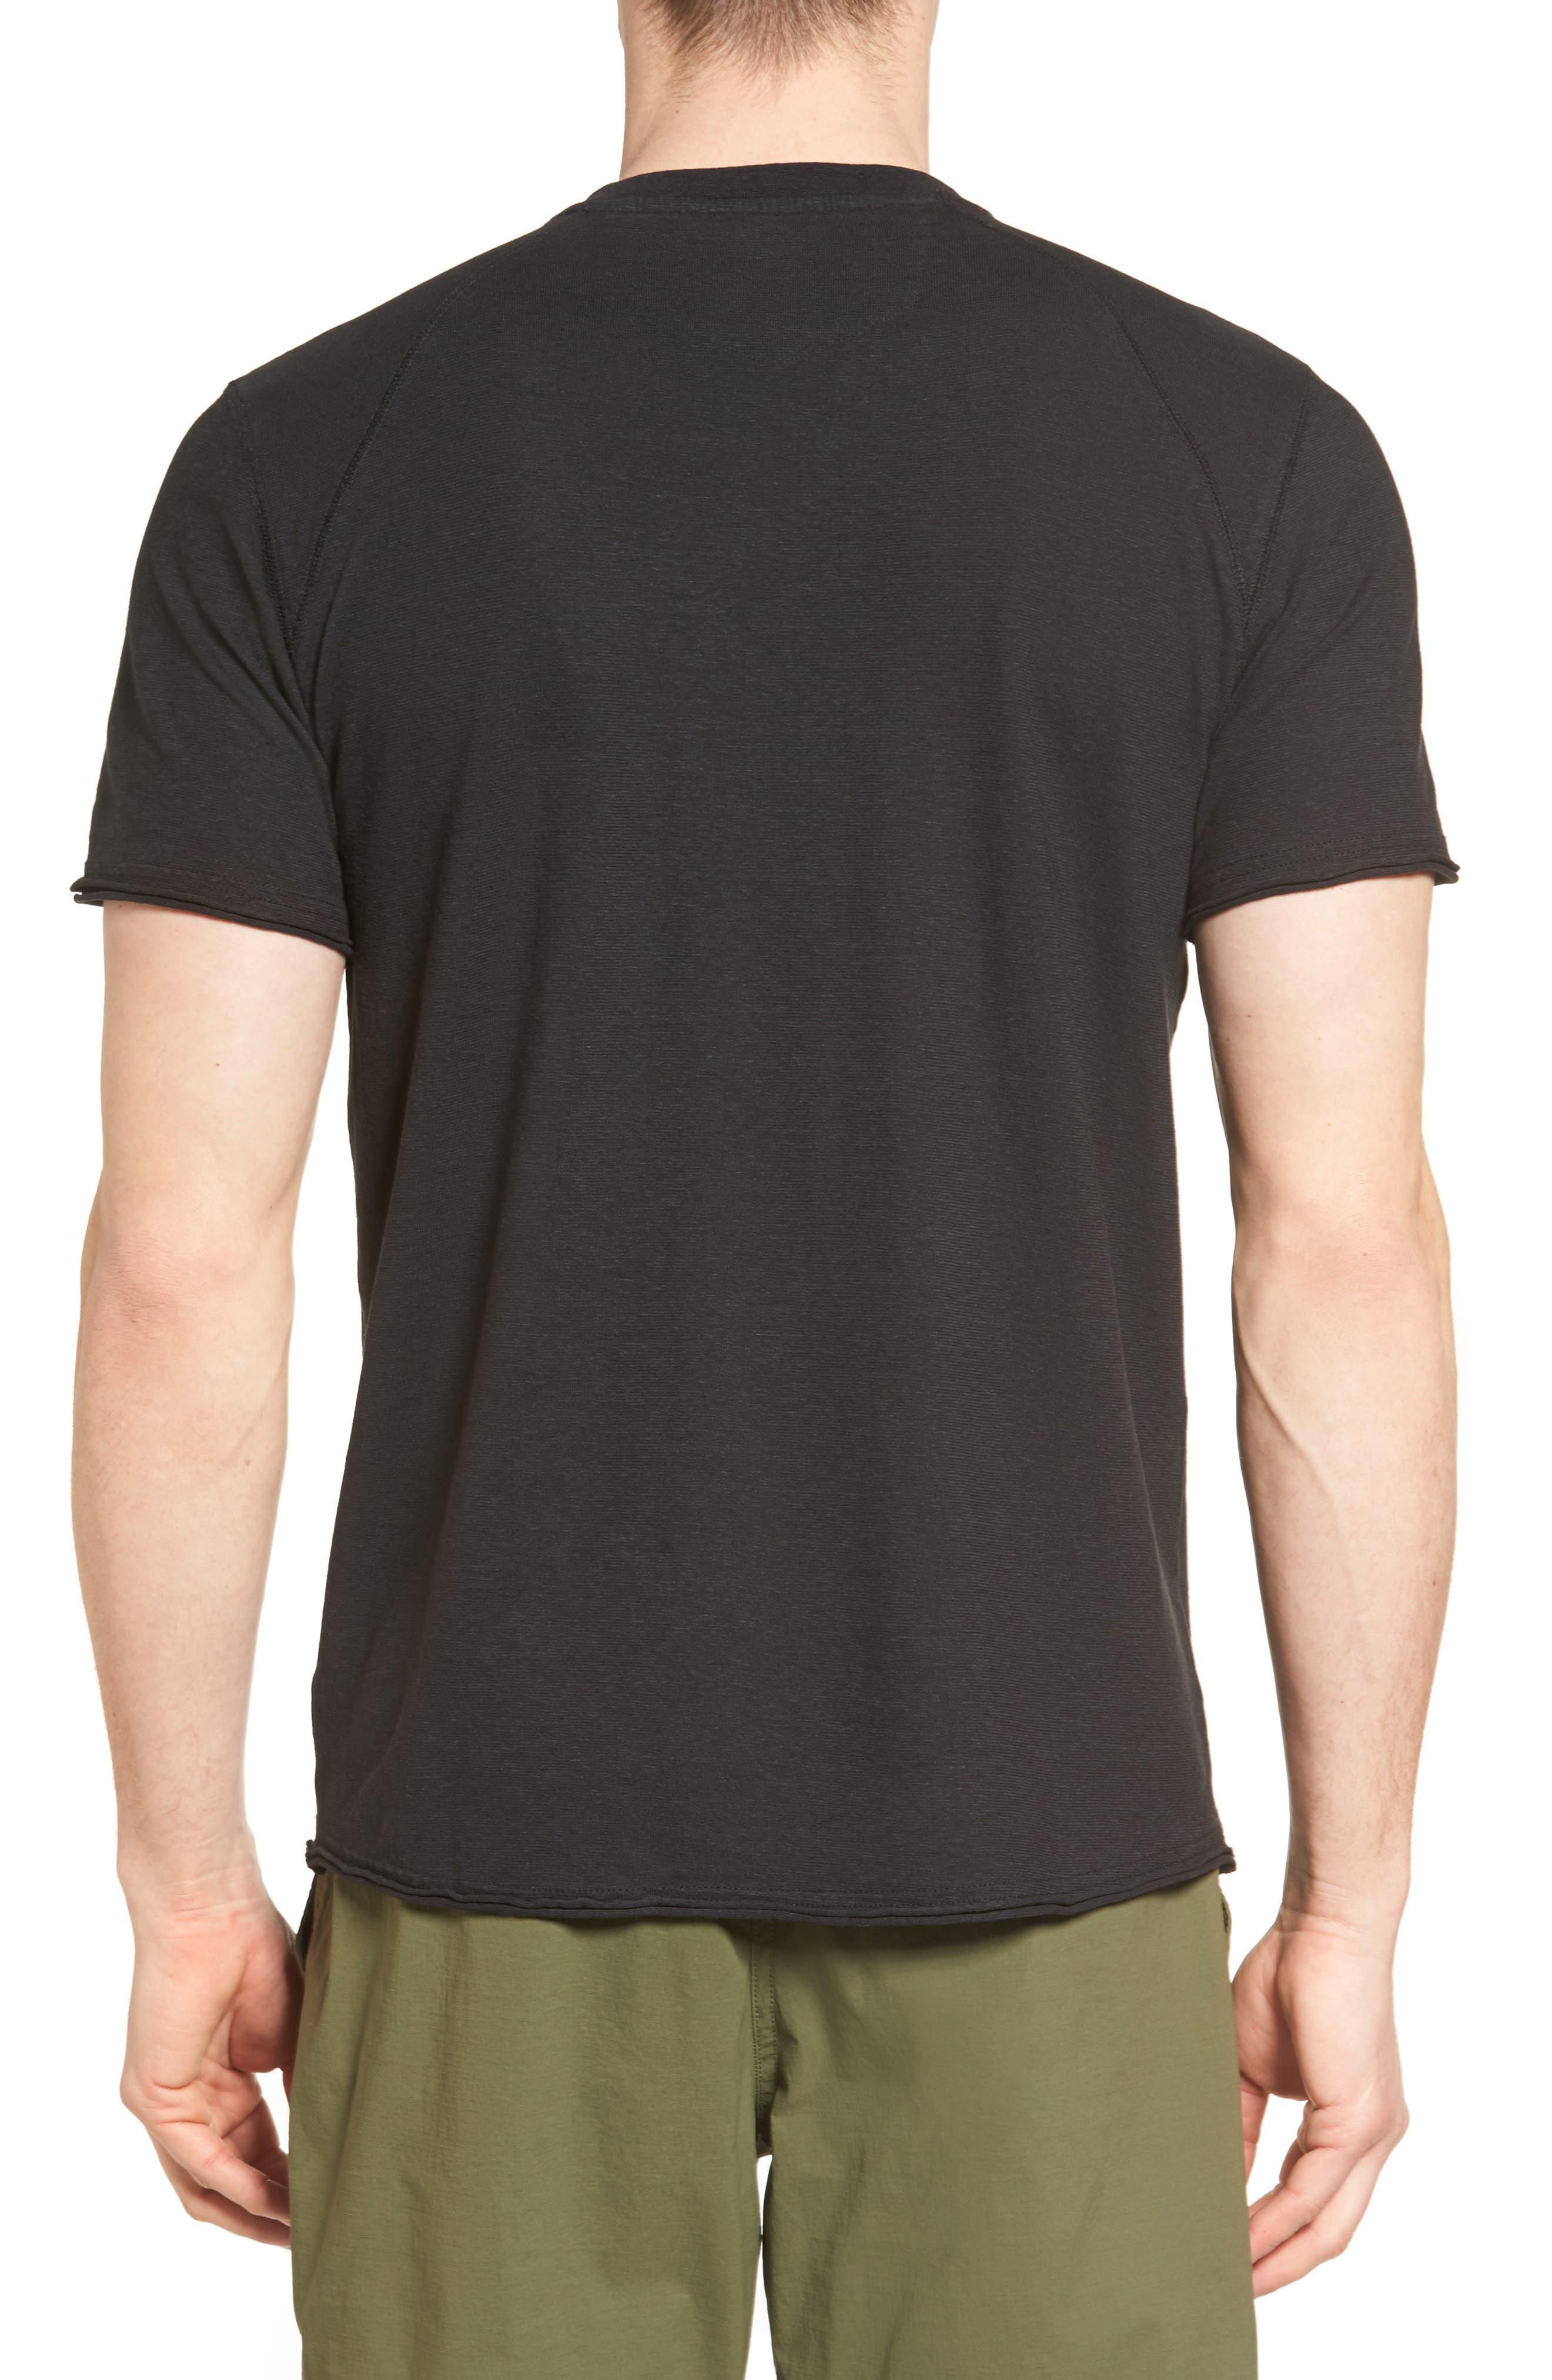 Alternate Image 2  - Gramicci Camura T-Shirt